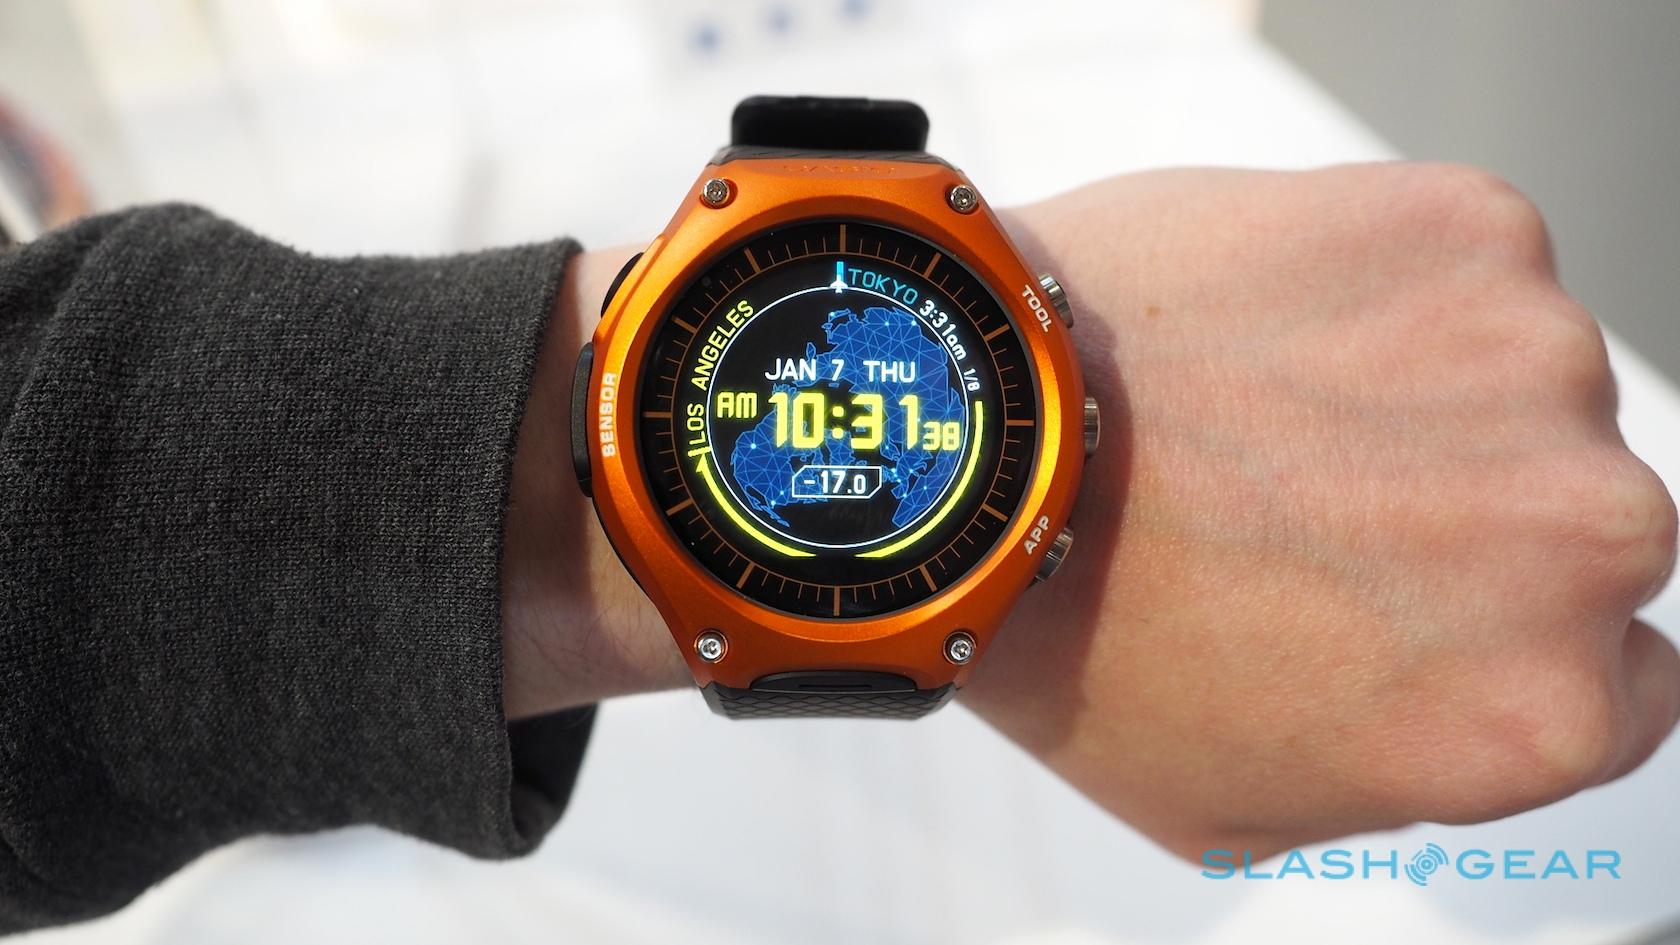 casio-smartwatch-ces-2016-hands-on-sg-11